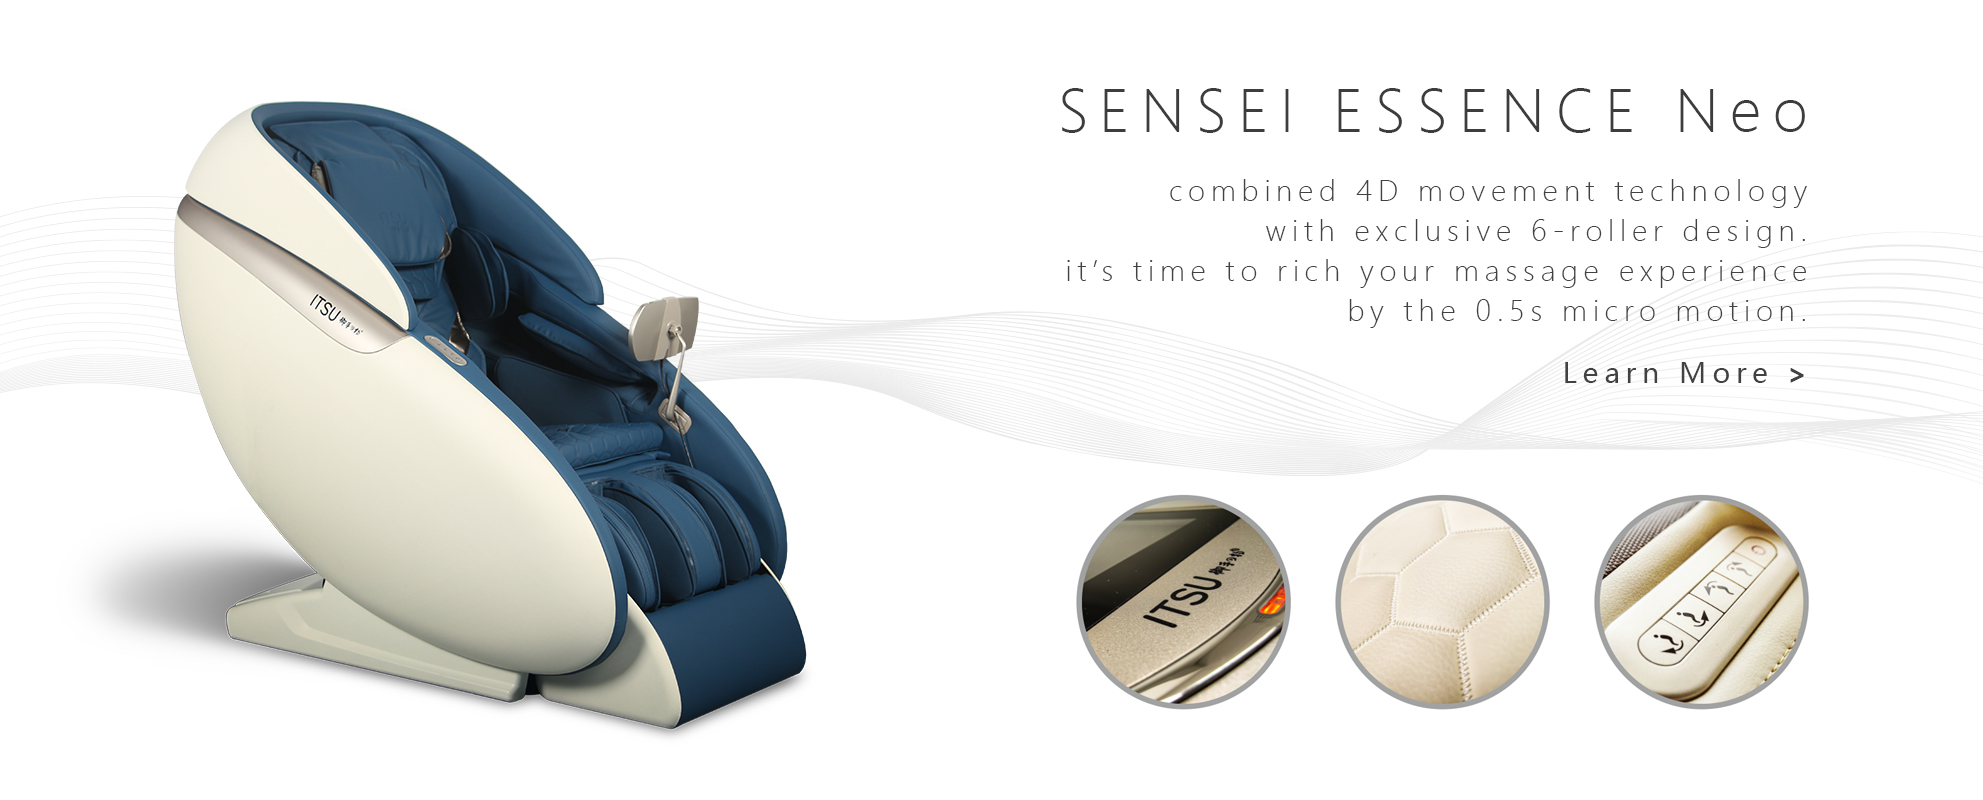 ITSU SENSEI ESSENCE Neo Massage Chair Banner